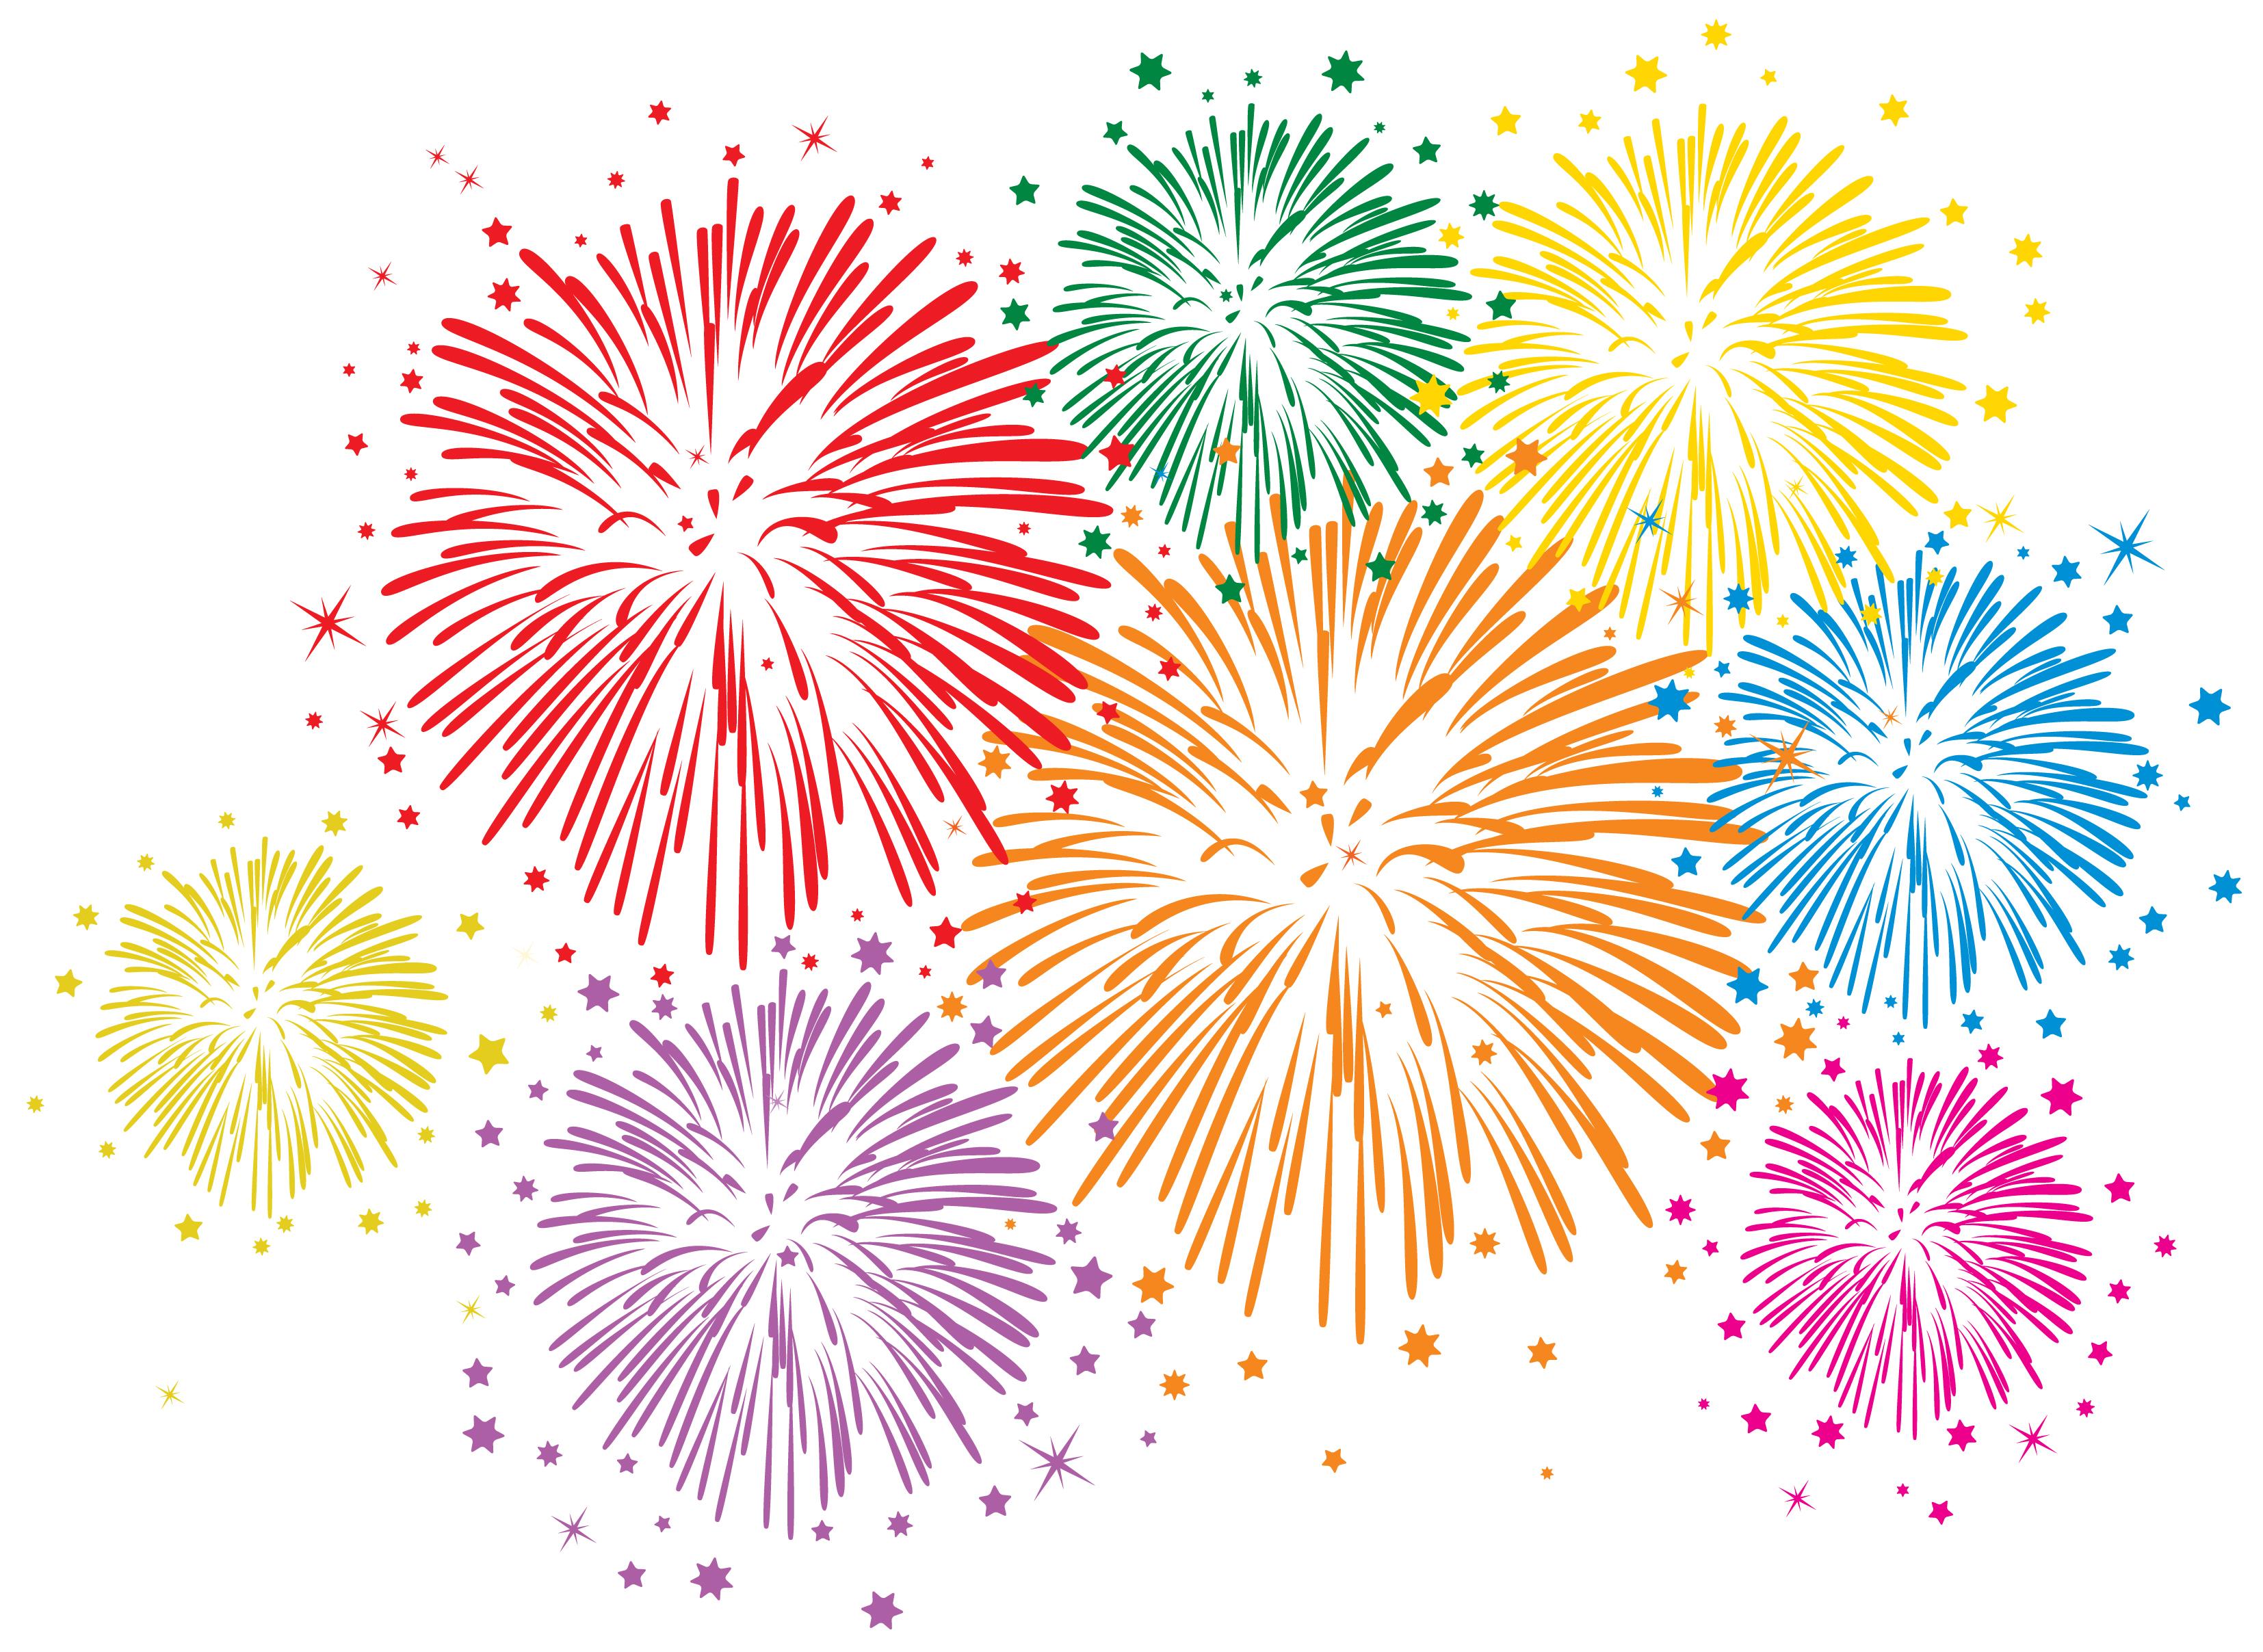 Fireworks Clipart & Fireworks Clip Art Images.